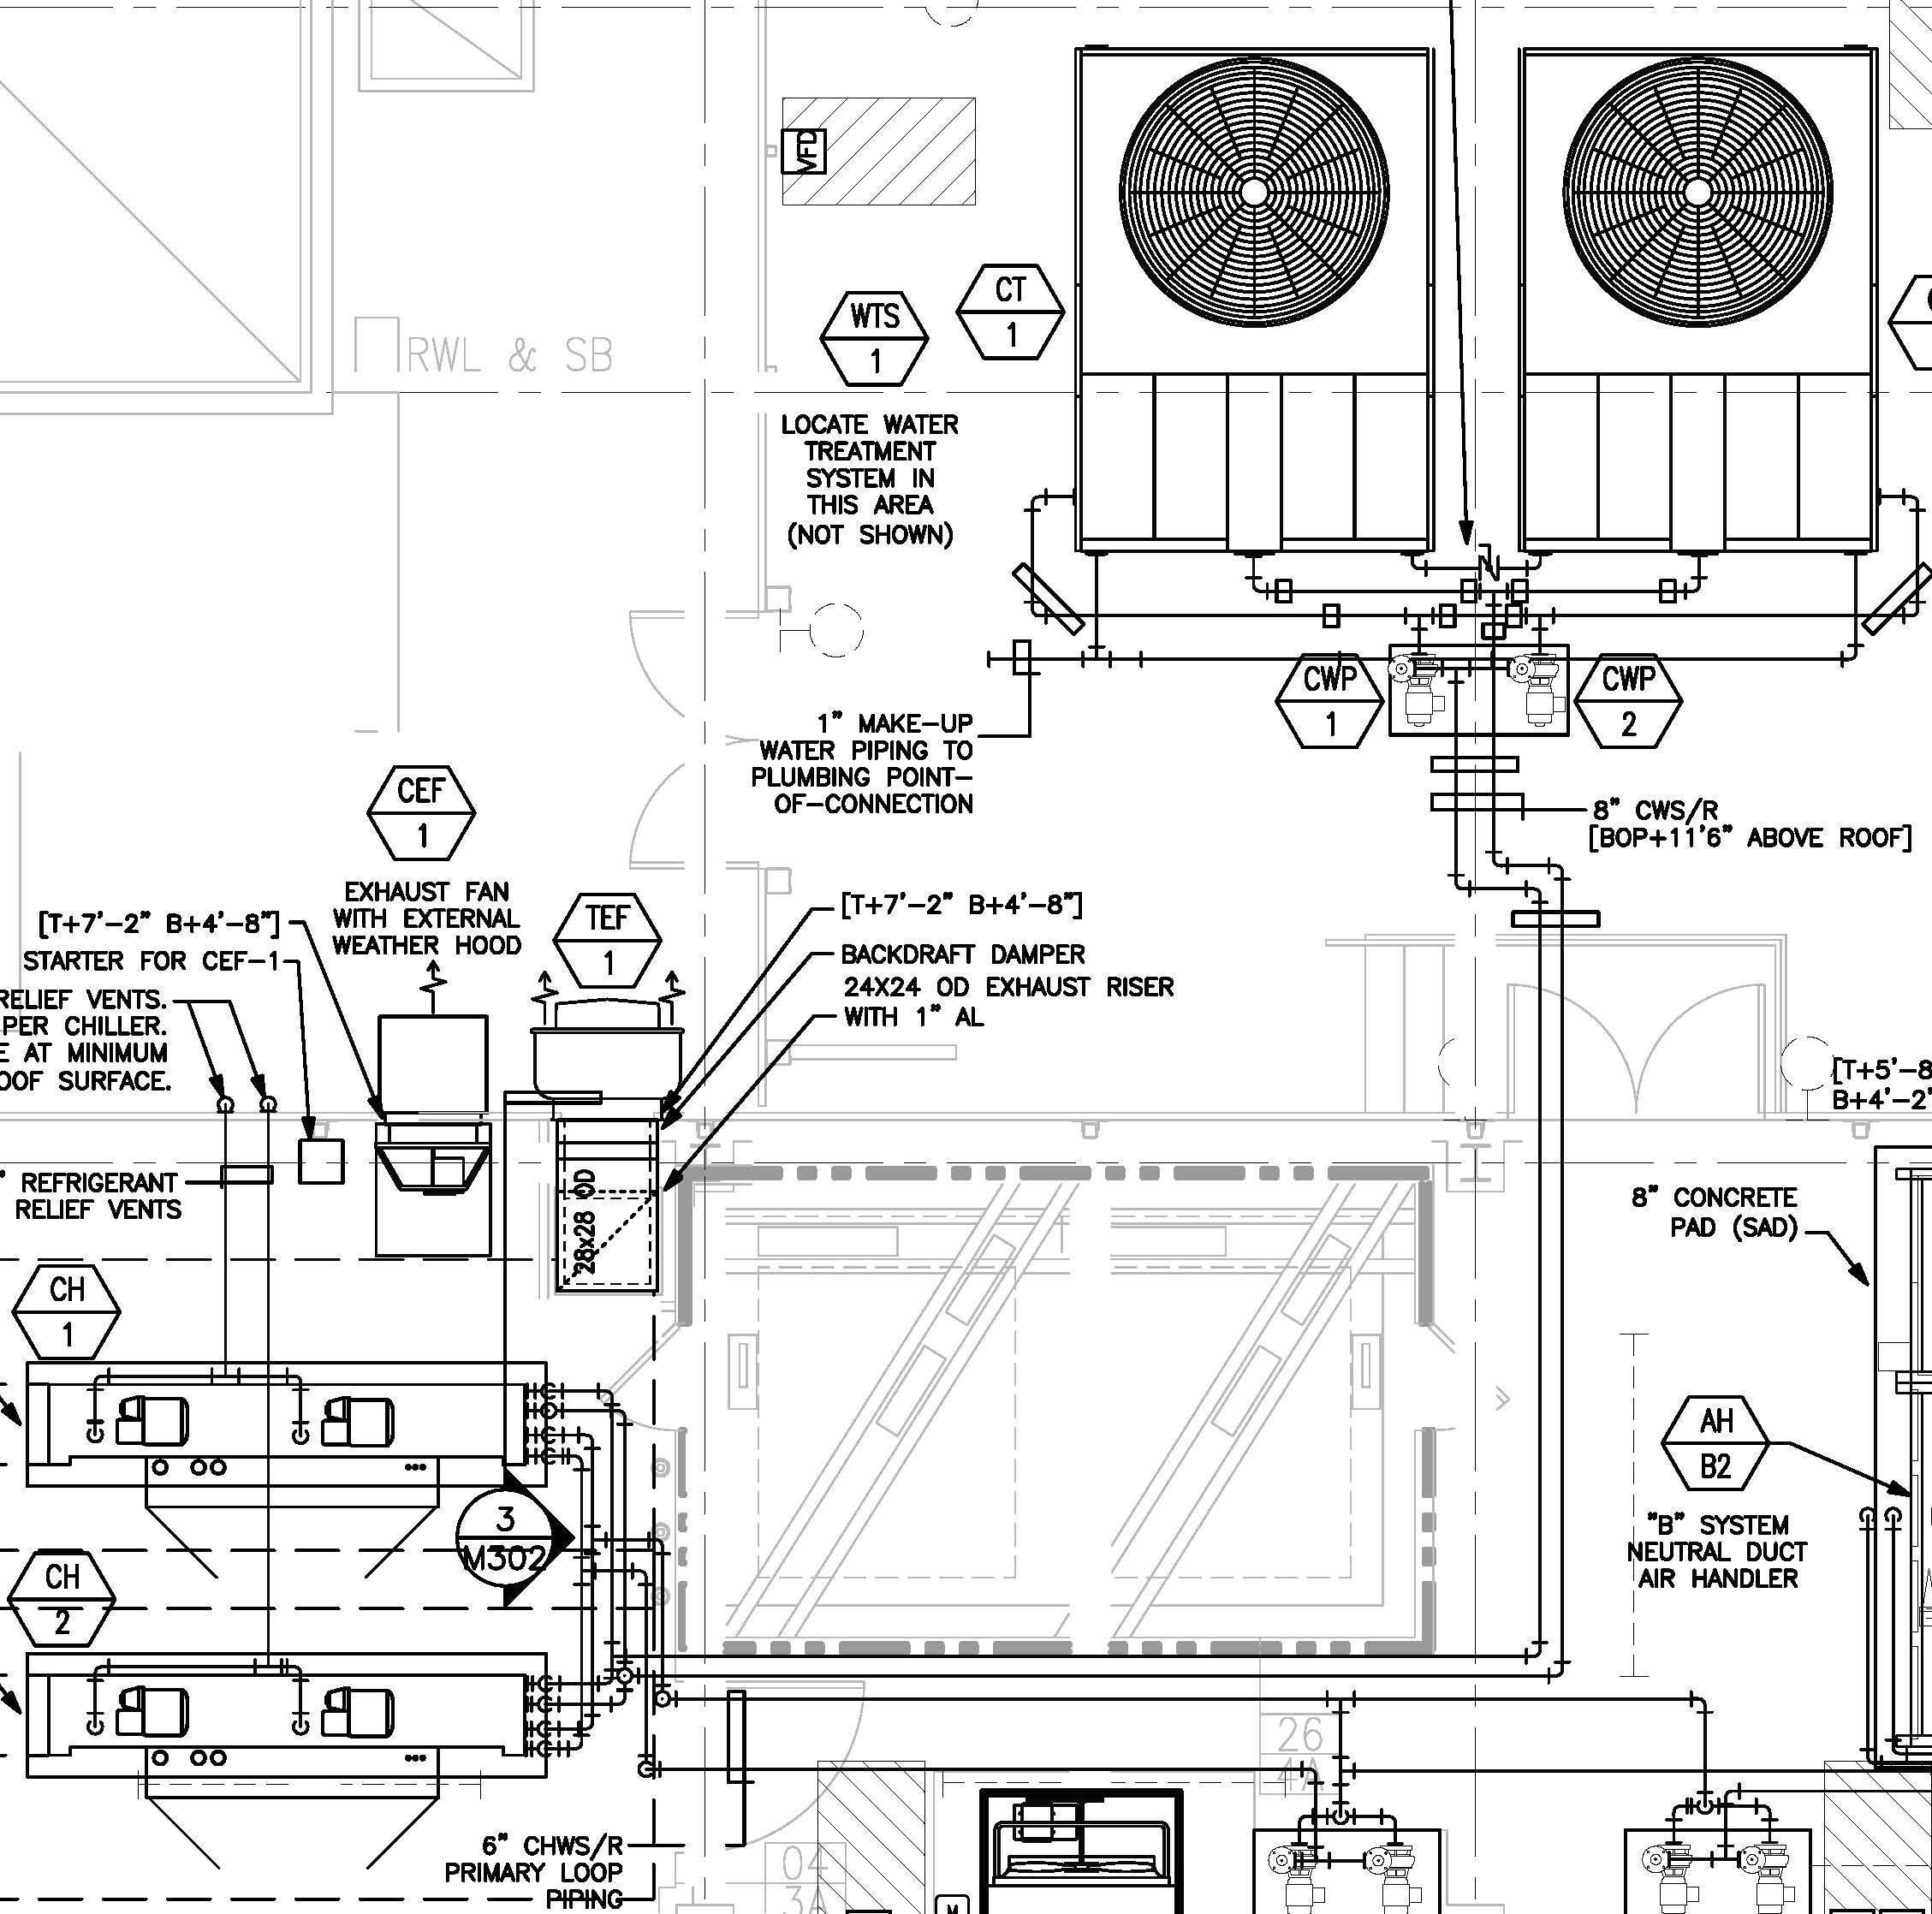 Car Engine Diagram for Dummies Basic Auto Ponents Diagram Schematic Diagrams Of Car Engine Diagram for Dummies